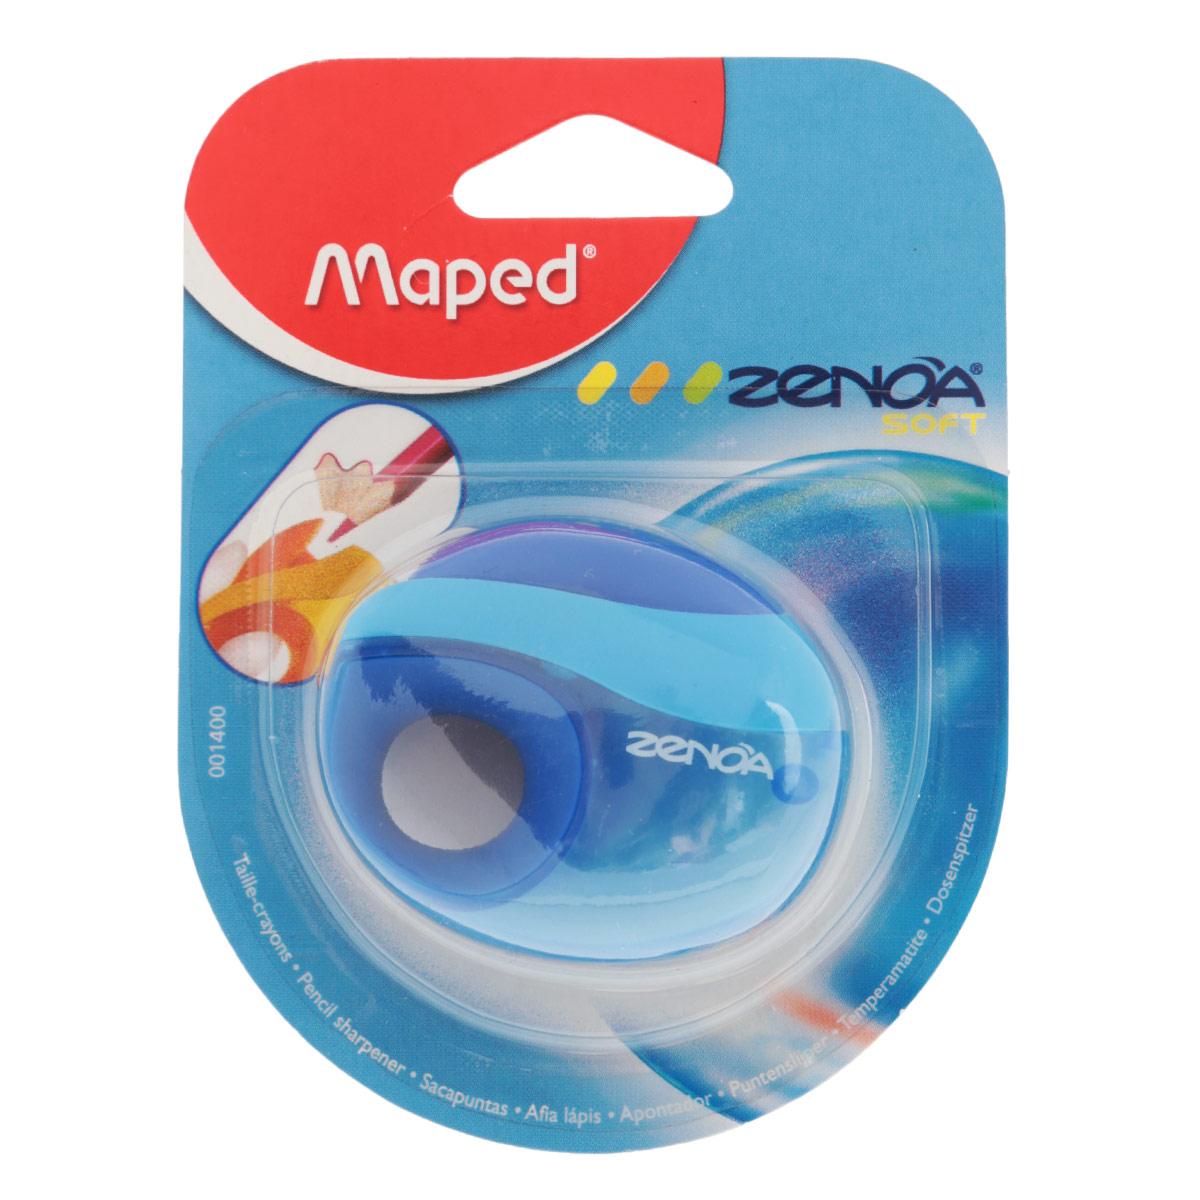 "Точилка Maped ""Zenoa"", с контейнером, цвет: синий 1400_синий"